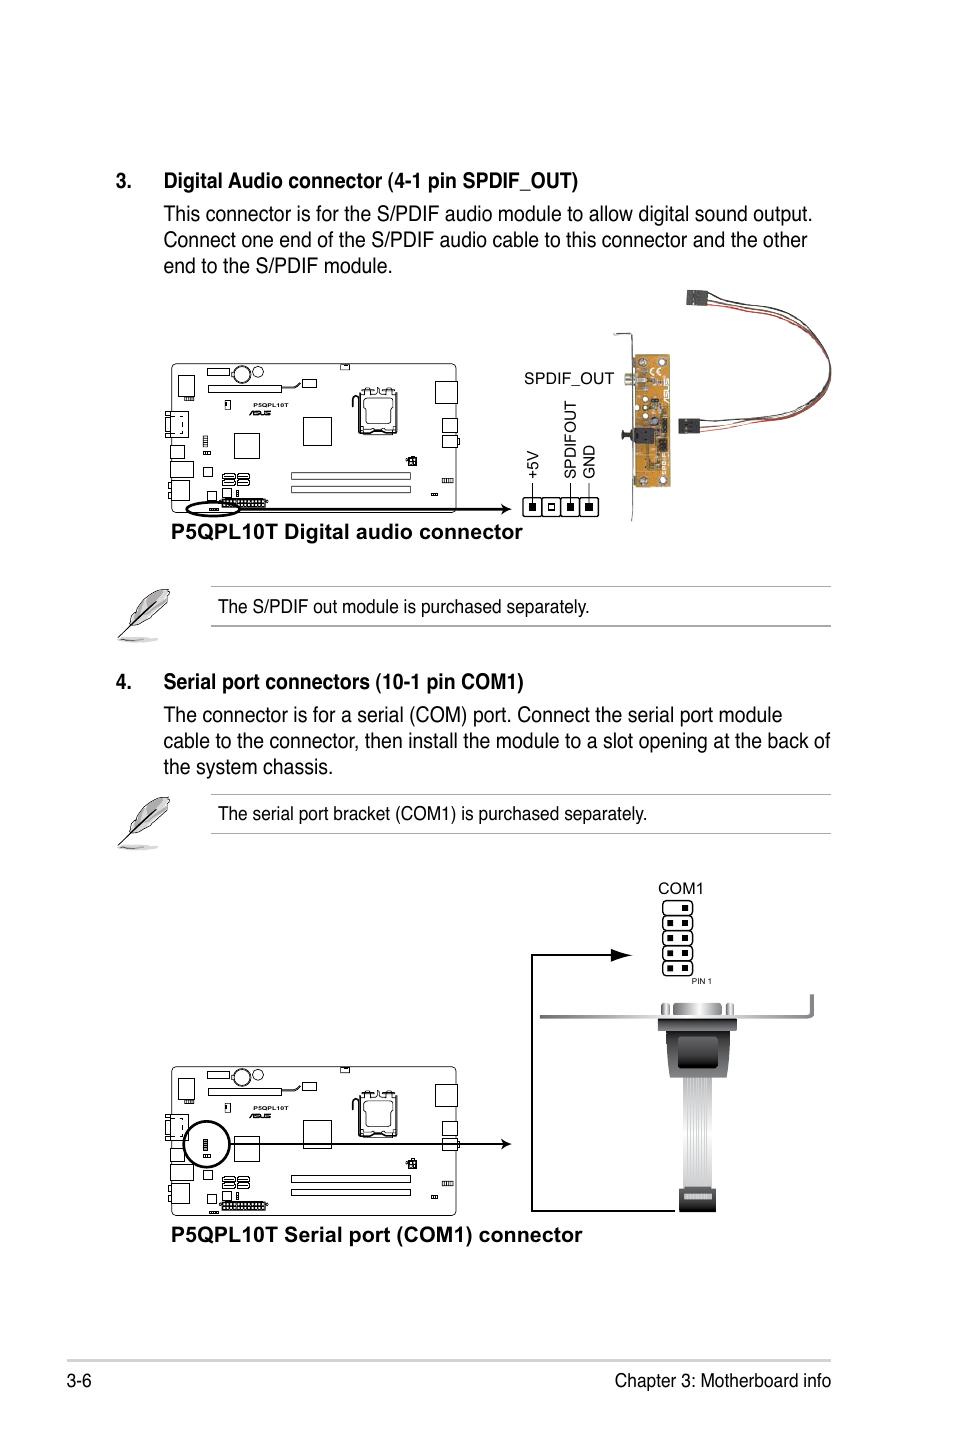 P5qpl10t Serial Port Com1 Connector Asus P6 P5g41e User Manual Wiring Diagram Page 35 67